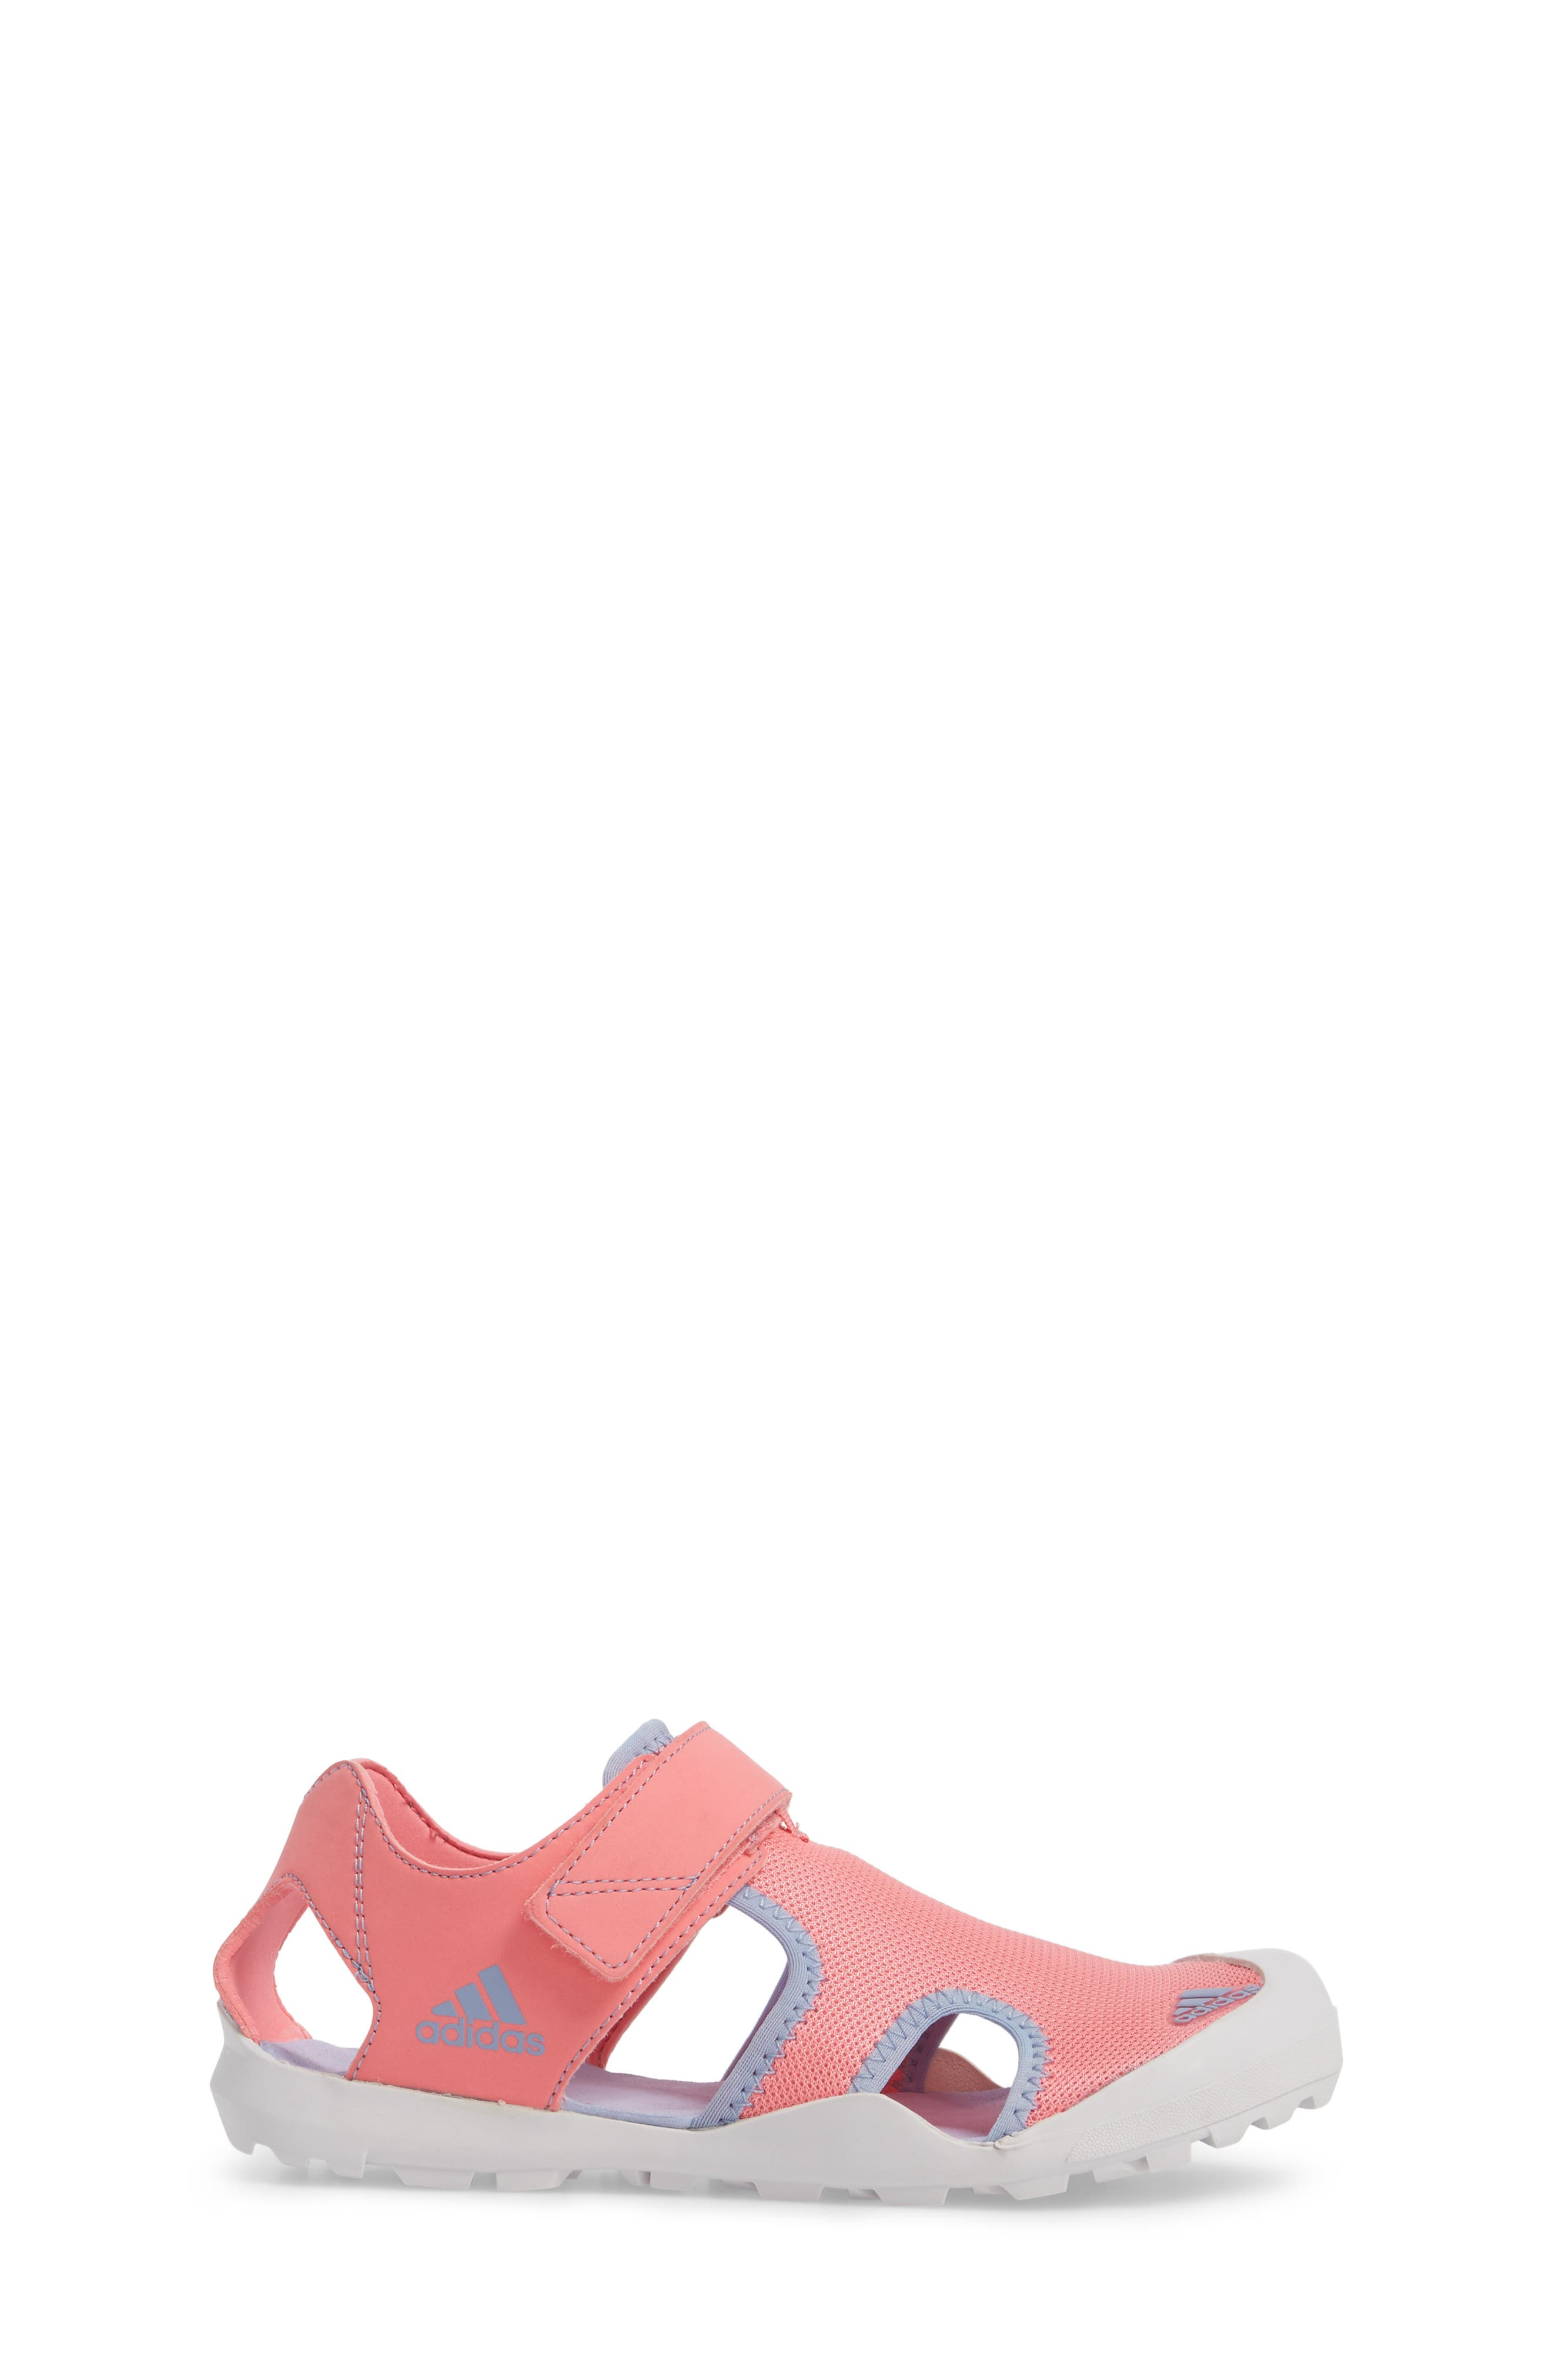 'Captain Toey' Sandal,                             Alternate thumbnail 3, color,                             Chalk Pink/ Chalk Blue/ Grey